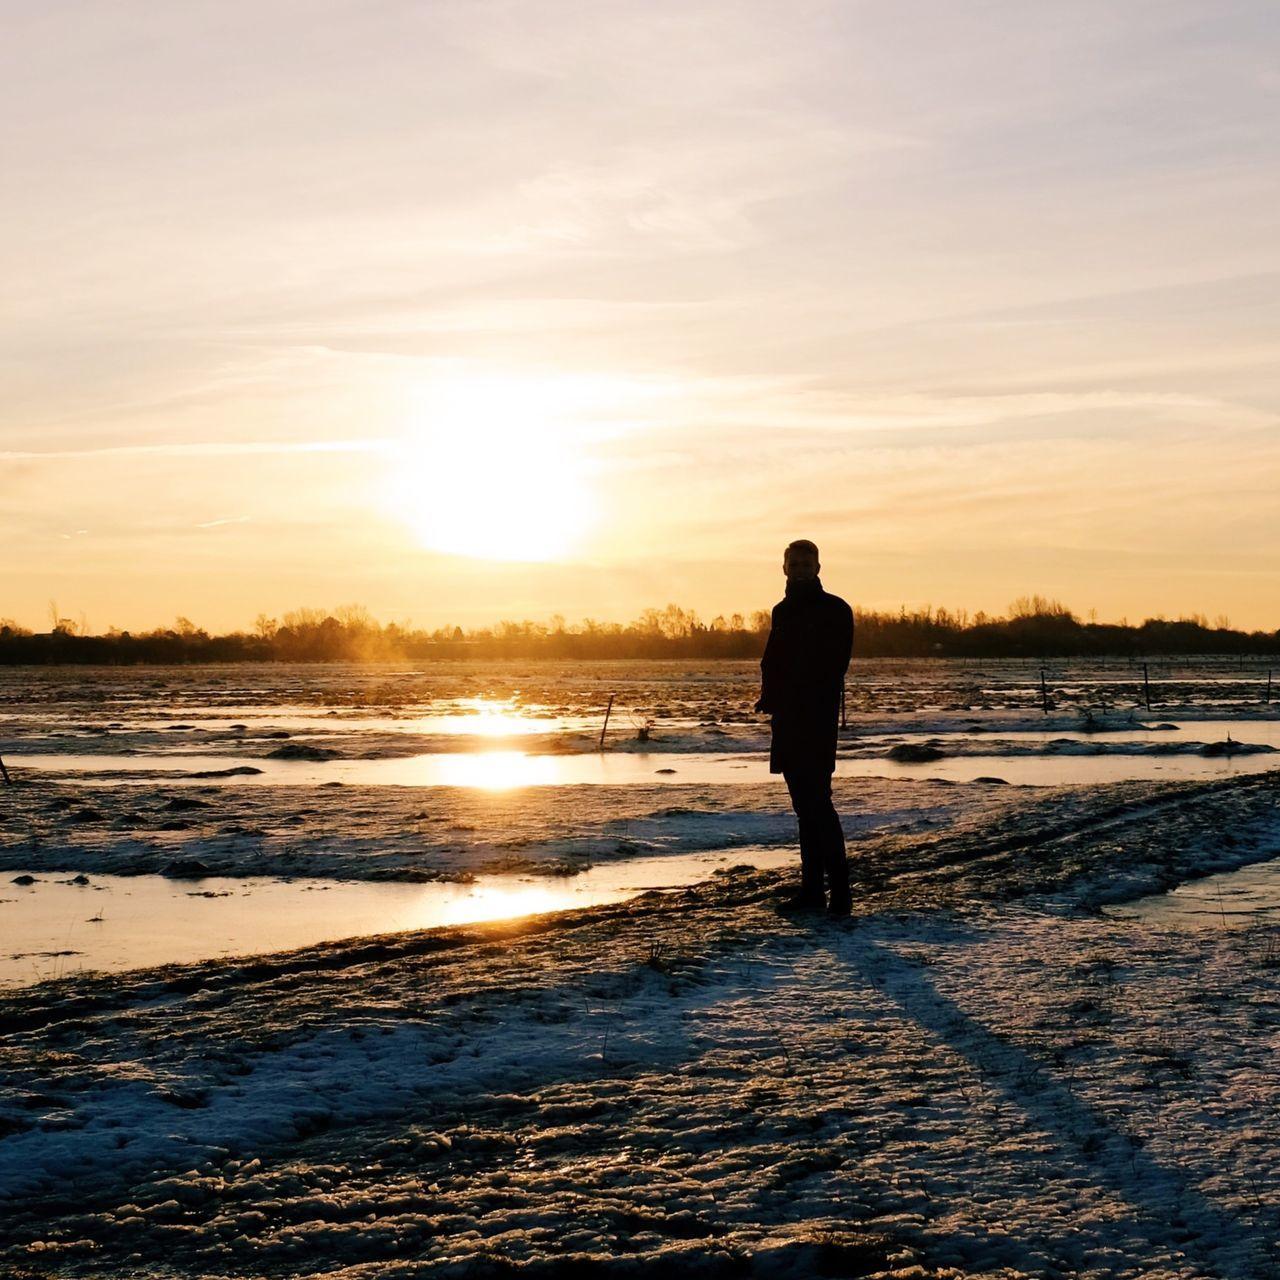 Watching the sunrise EyeEm Nature Lover Silhouette Nature_collection Landscape EyeEm Best Shots EyeEm Best Shots - Nature Copenhagen Sunrise_sunsets_aroundworld Sunrise